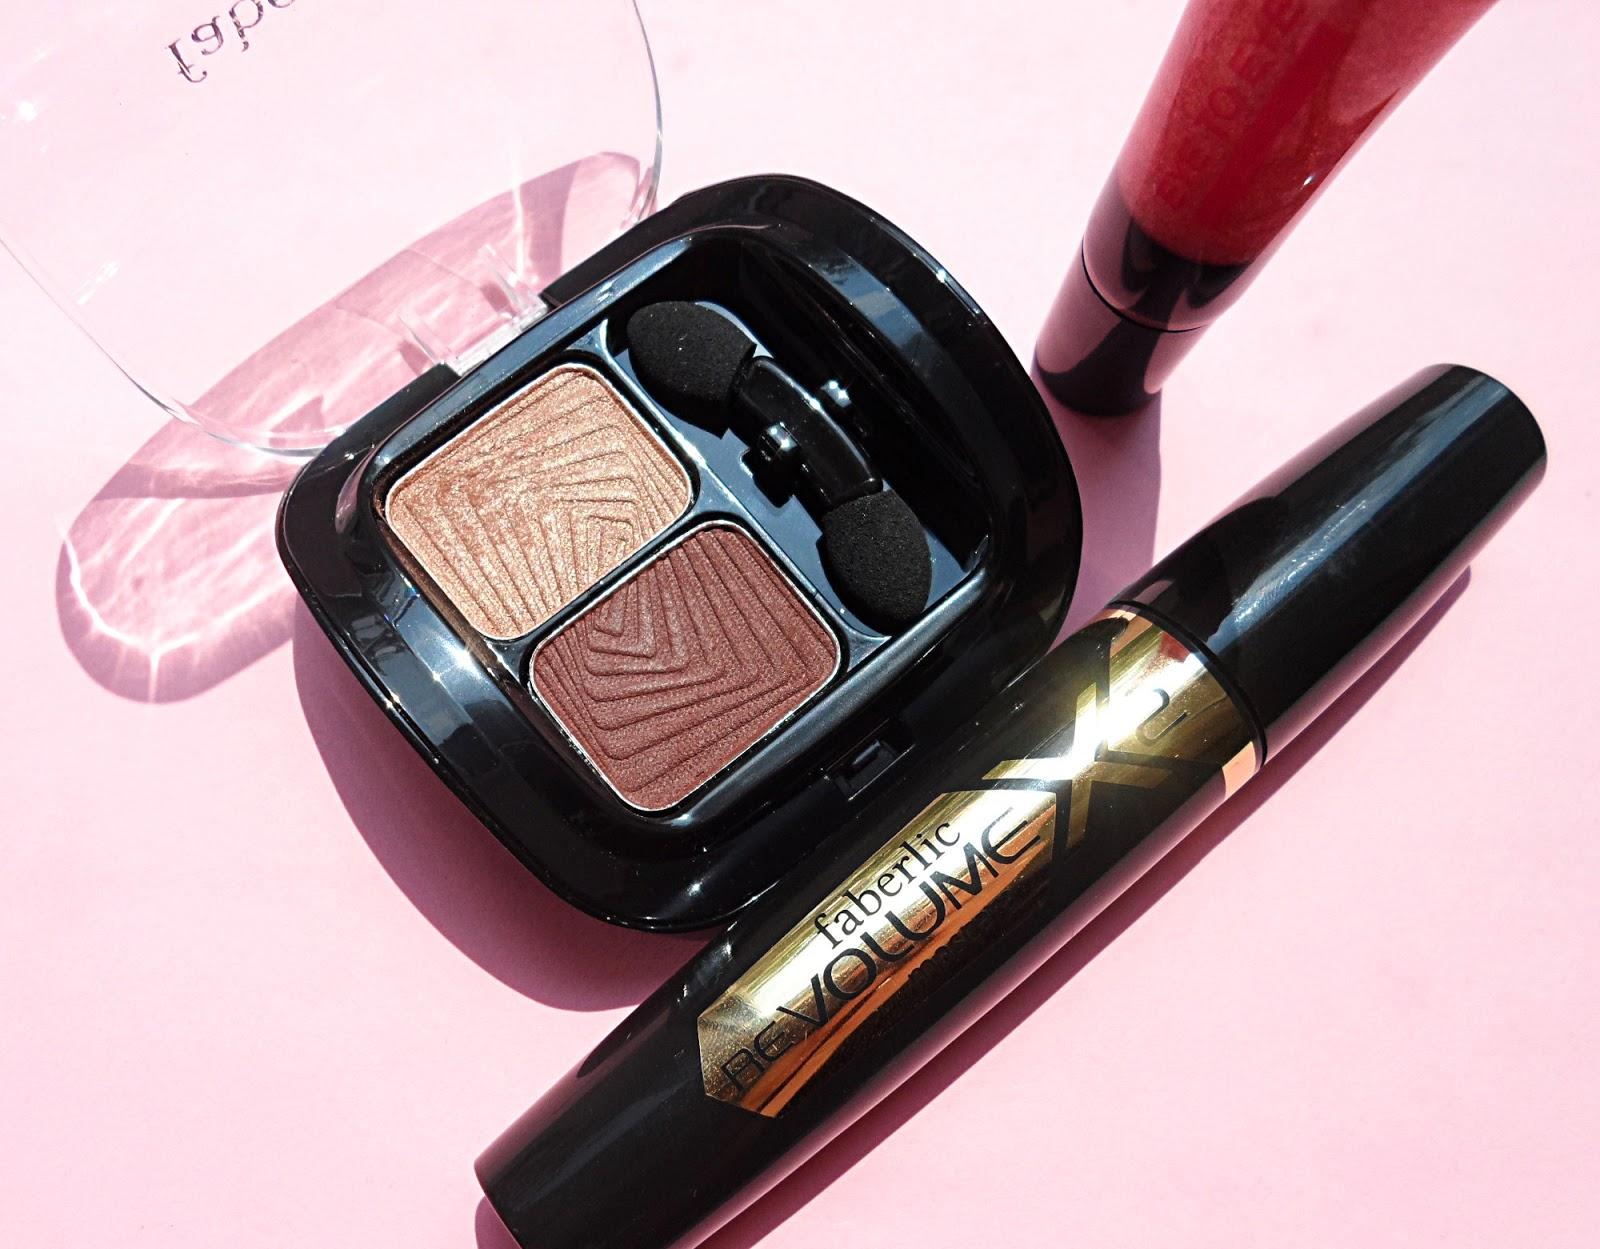 beauty fashion lifestyle blog blogger giveaway makeup haul giveaway prize to win free makeup cosmetics sample liz breygel beauty angel blog